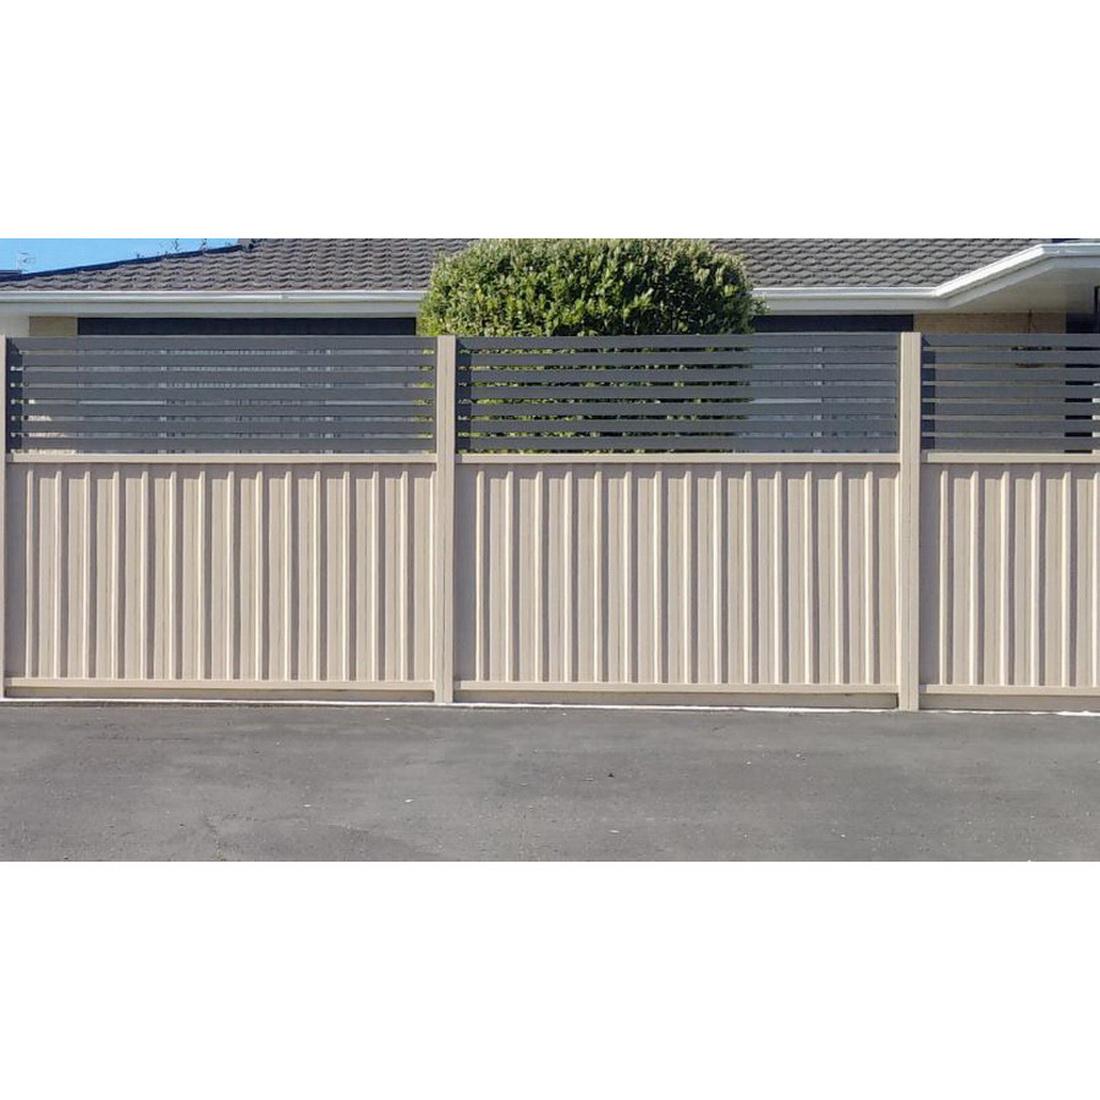 Sector Borderline 1.2/6 Fencing Panel 1800 x 2300mm 600mm Aluminum Slat Infill Grey Friars SBO1.2/0.6-GF